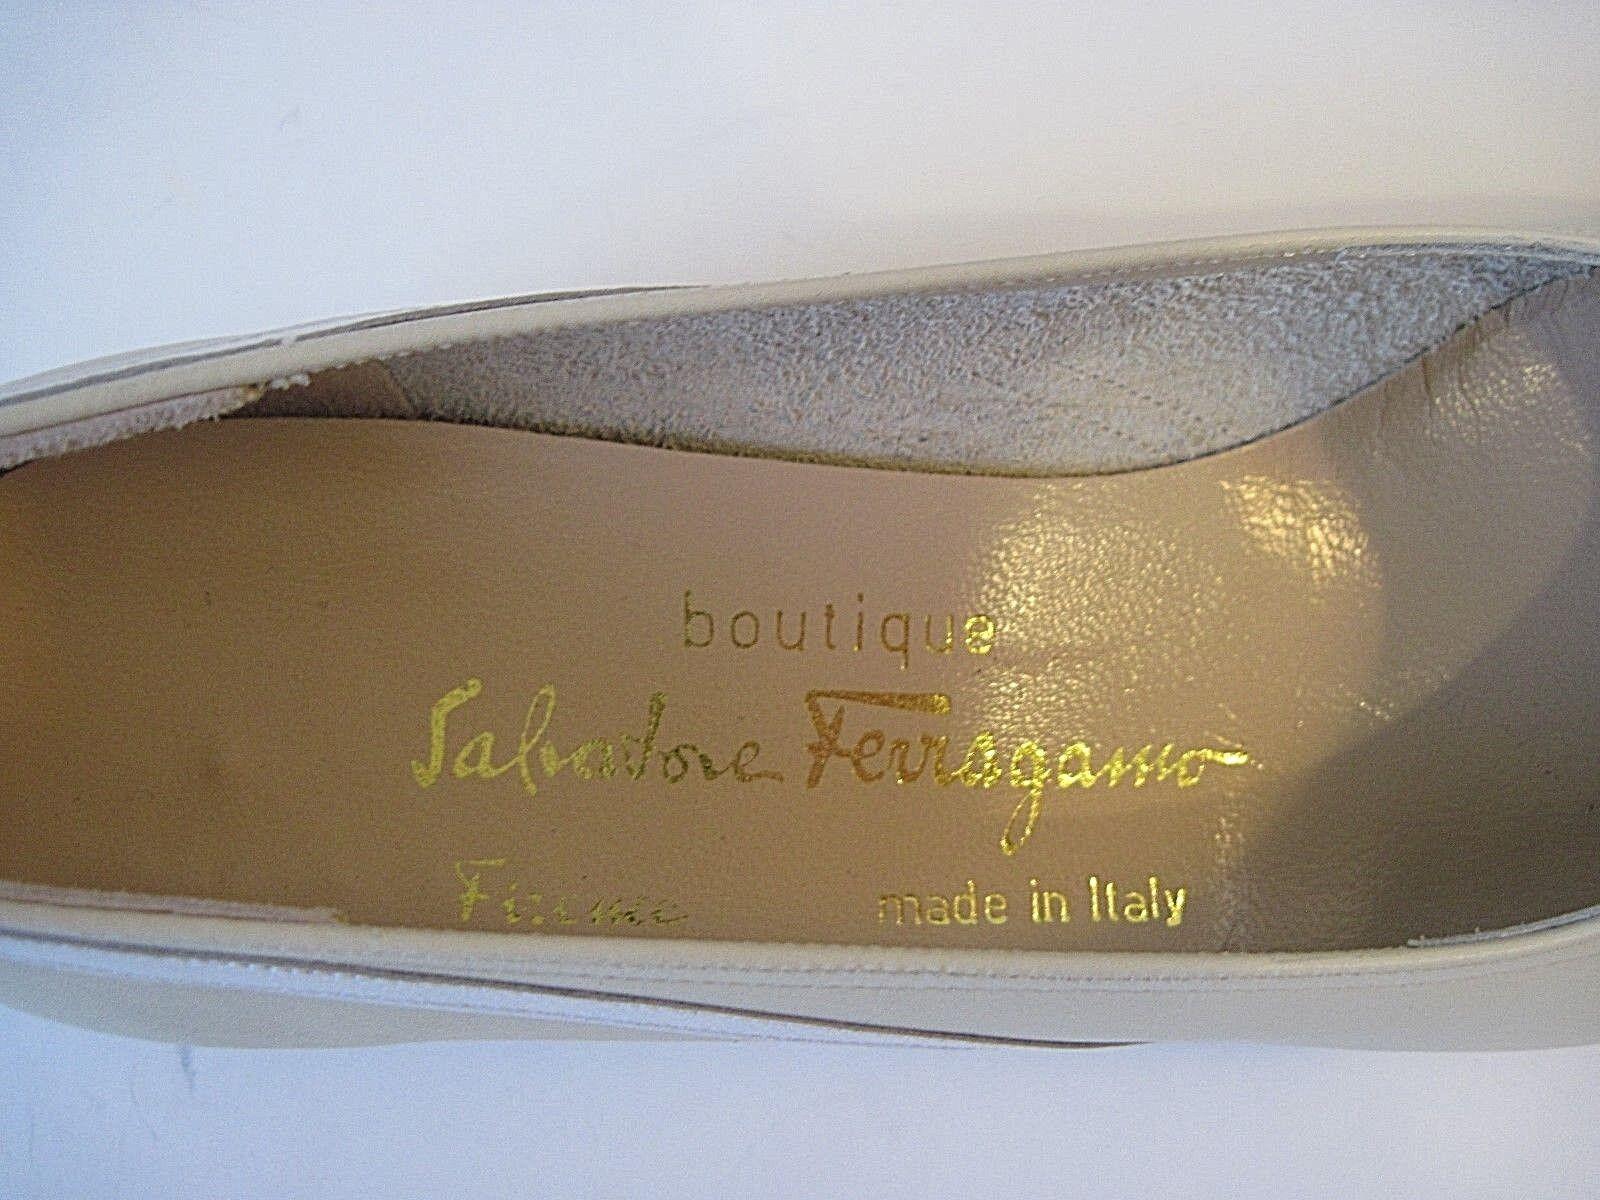 Salvatore Ferragamo Cream Weiß Leder Loafers Größe 6.5 2A, 2A, 2A, Excellent 85e77b